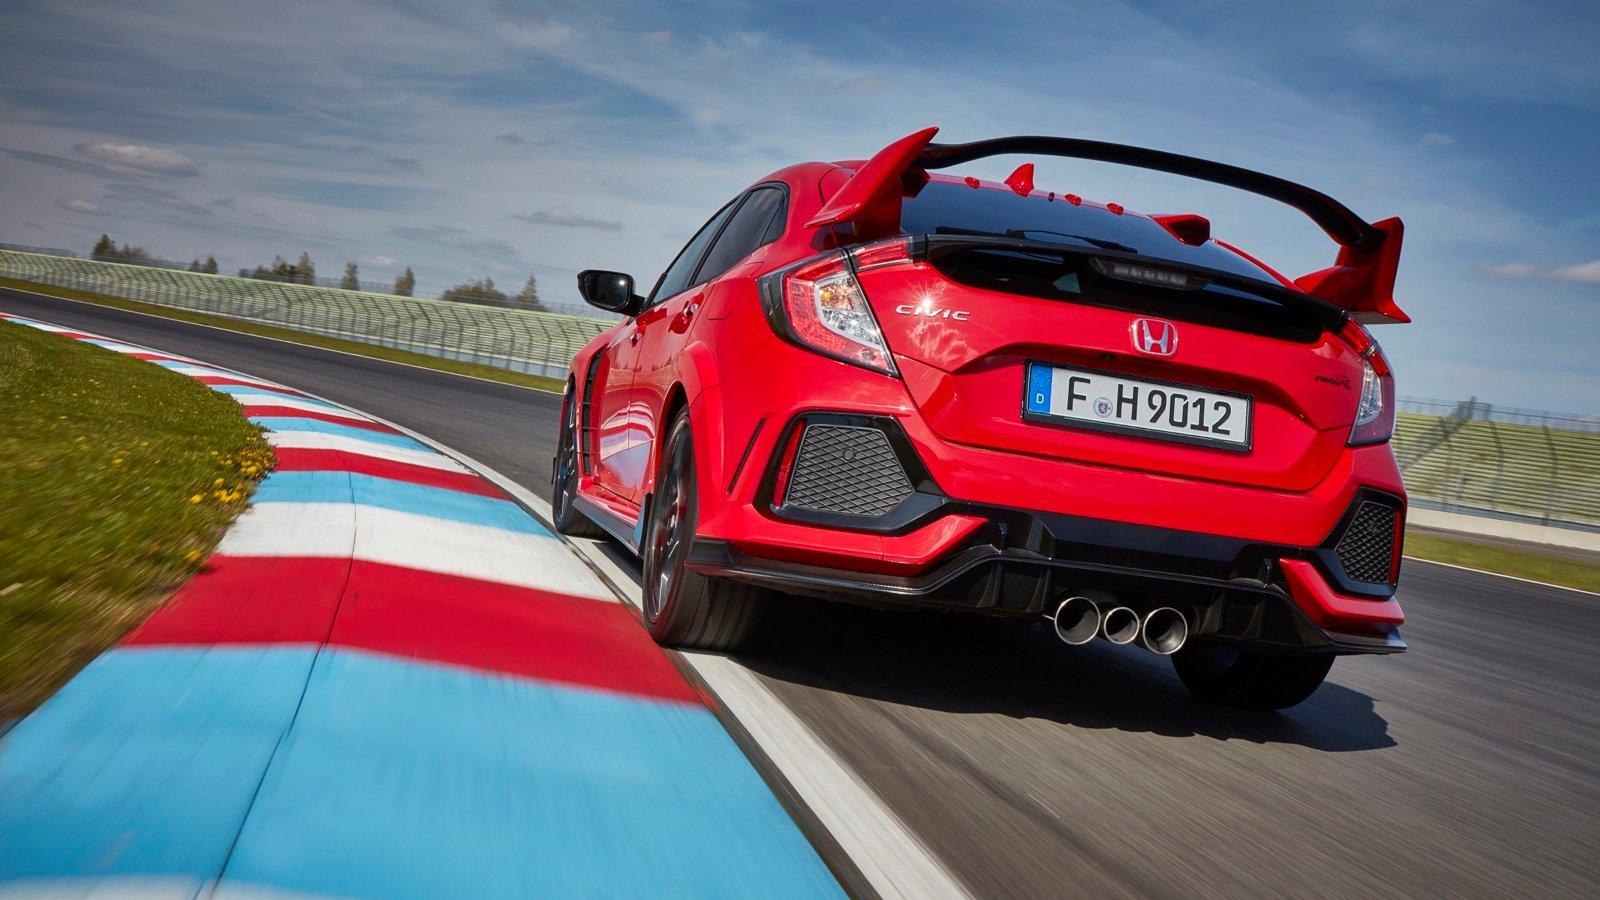 2018 Honda Civic Type R triple exhaust makes the car quieter… wait, what?